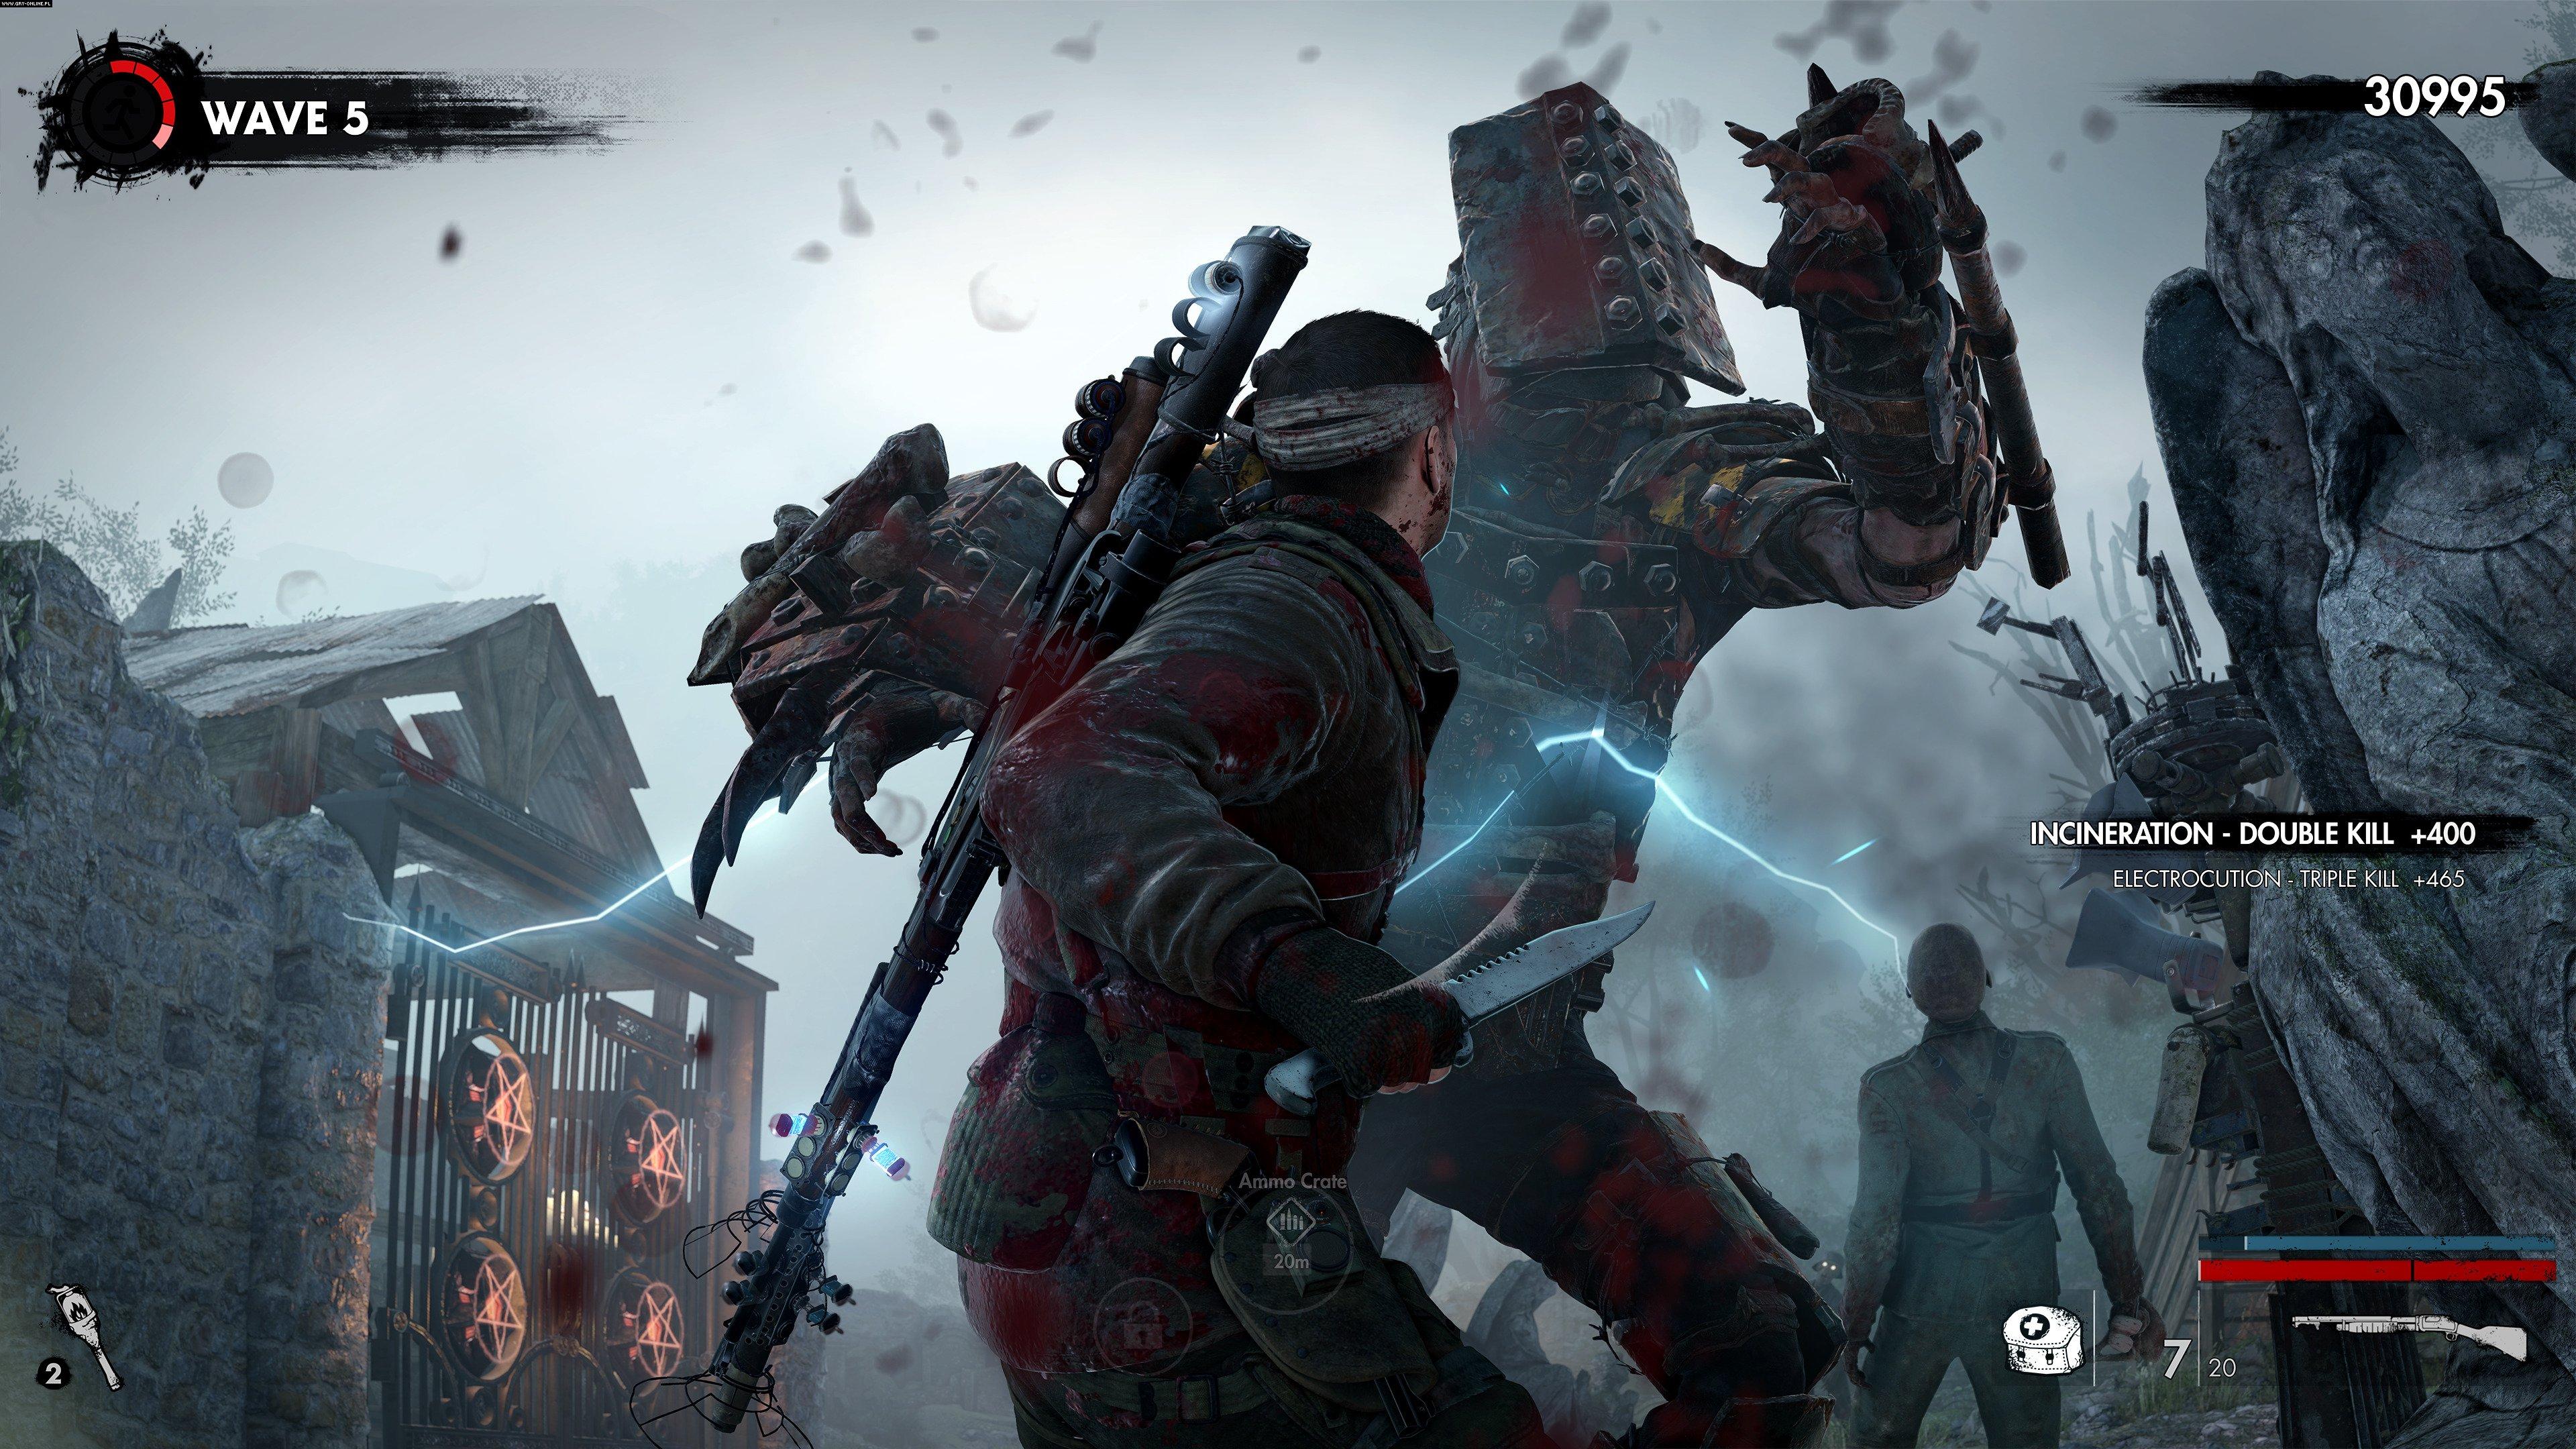 Zombie Army 4: Dead War PC, PS4, XONE Games Image 3/27, Rebellion